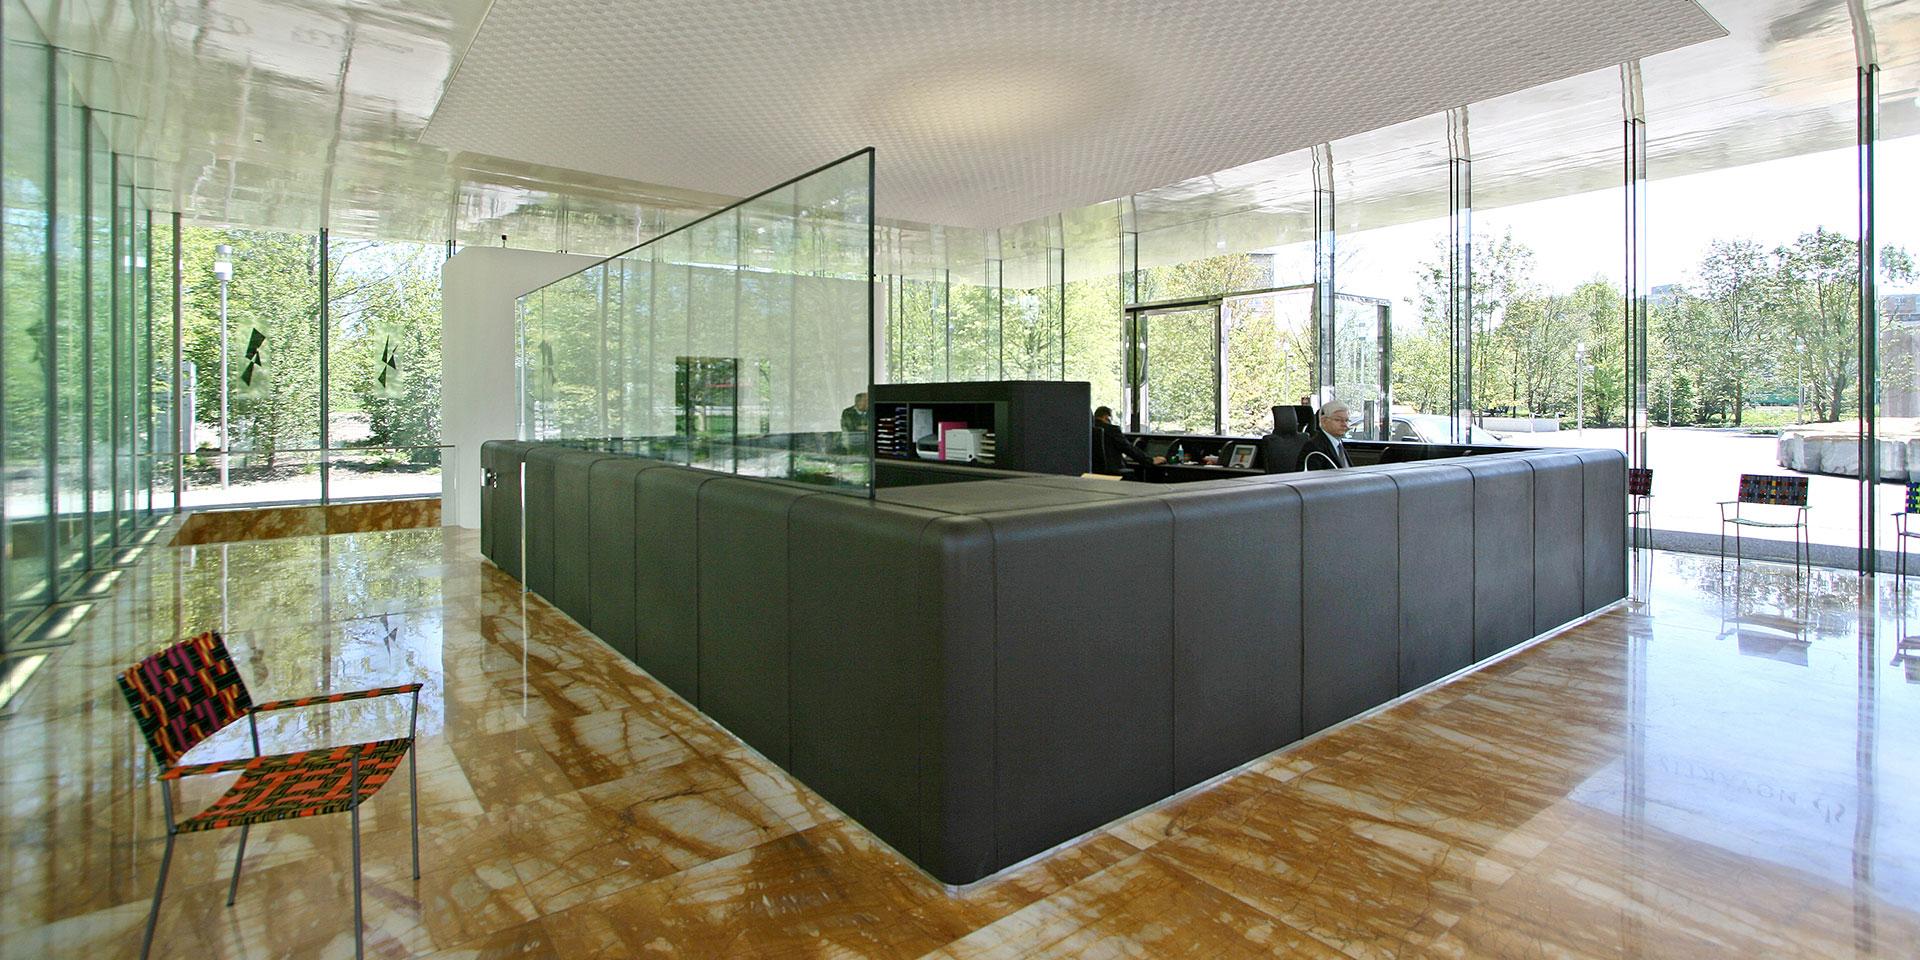 polster factory d pp d pp polsterm bel polsterm bel neu beziehen d pp polsterm bel d pp. Black Bedroom Furniture Sets. Home Design Ideas